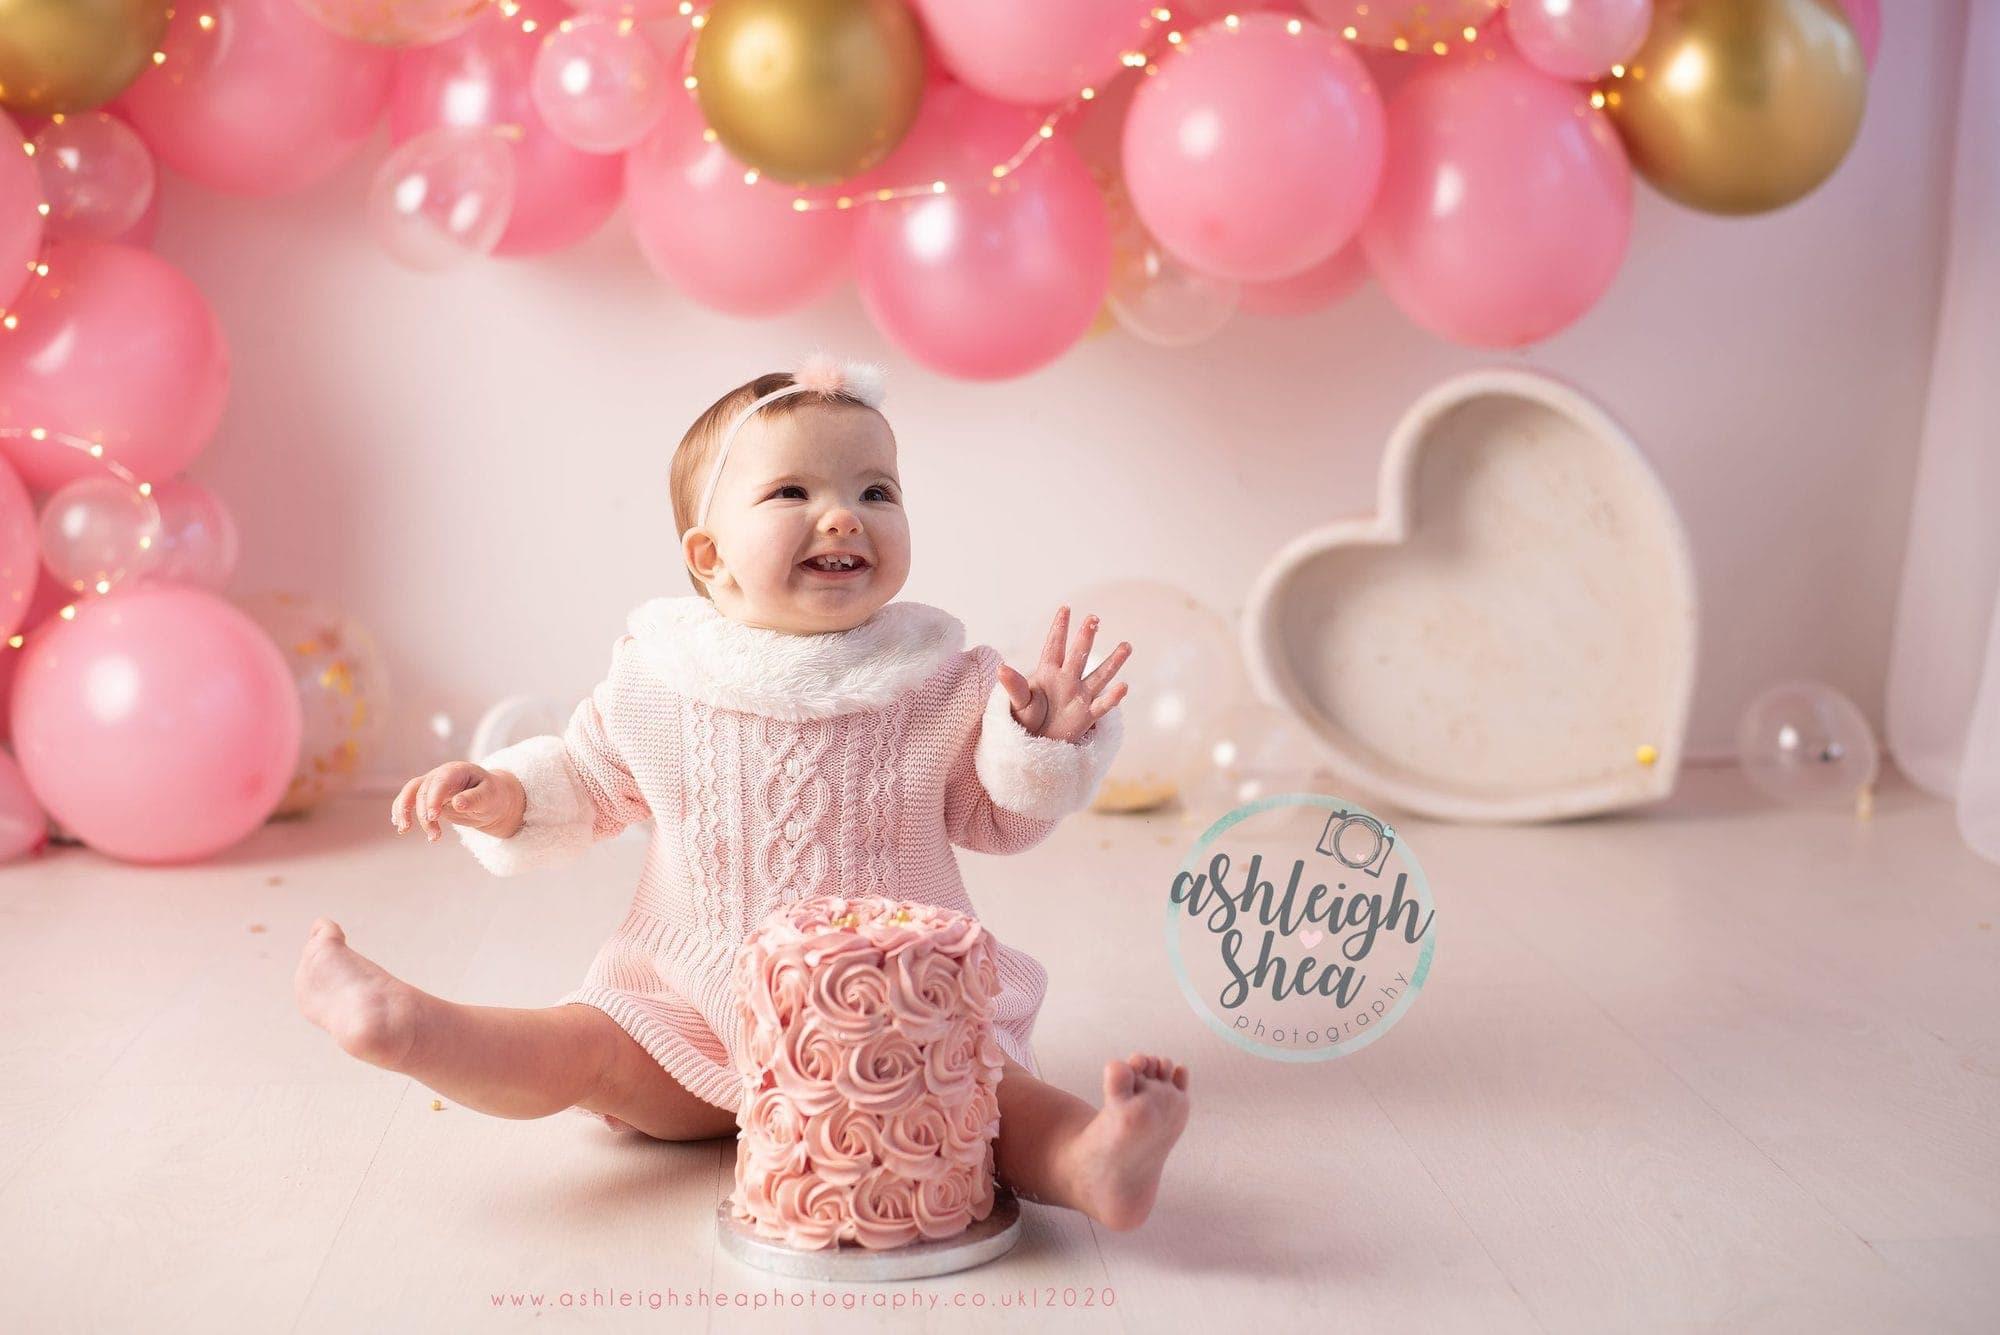 Excited, First Birthday, Little Girl, Cake Smash, London, Kent Photographer, Ashleigh Shea Photography